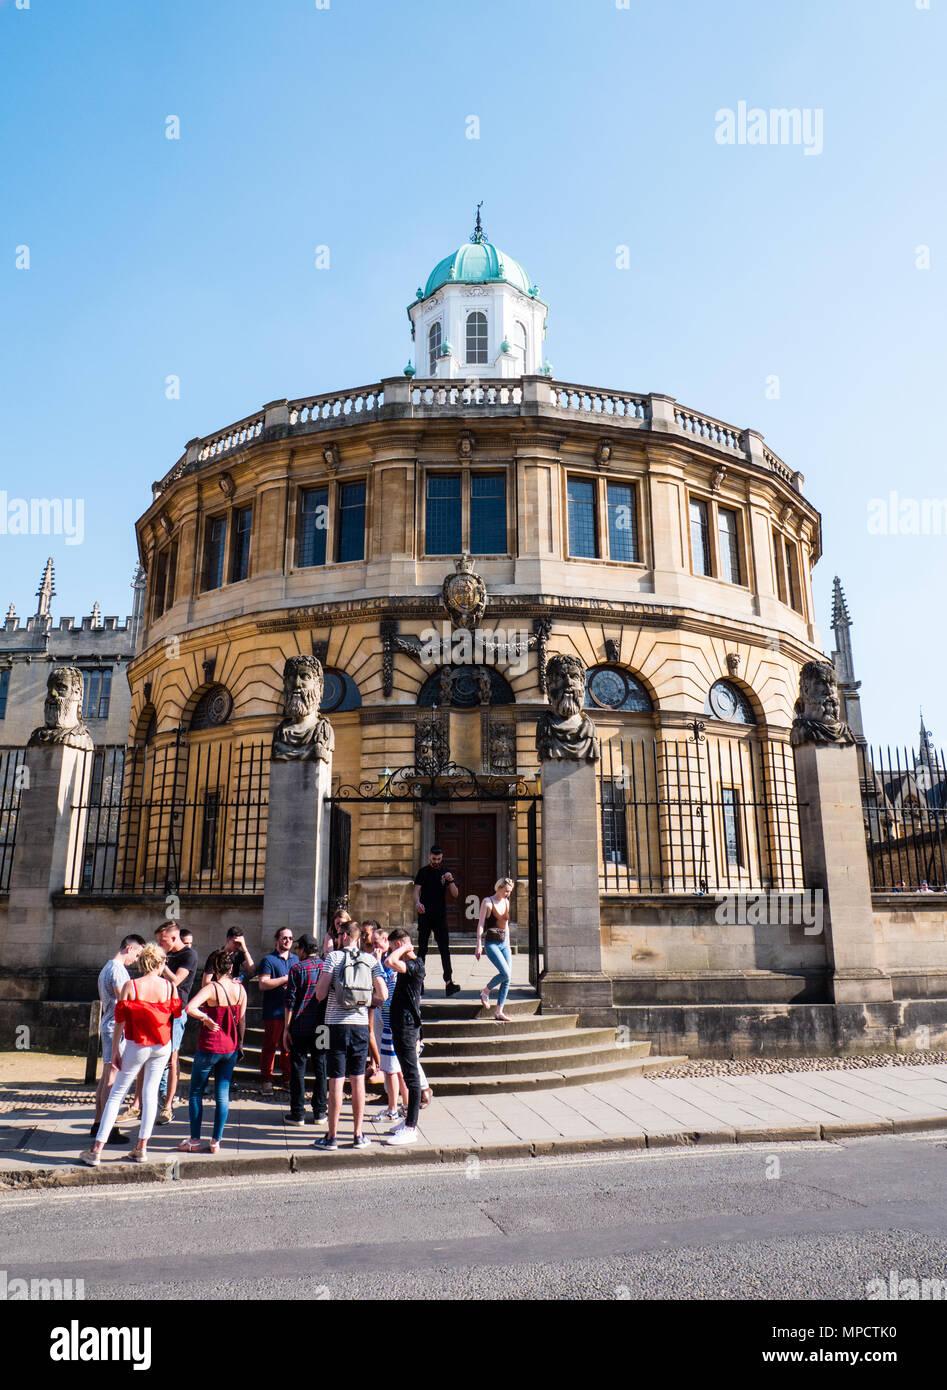 Tourists outside,The Sheldonian Theatre, University of Oxford, Oxfordshire, UK, England, UK, GB. - Stock Image